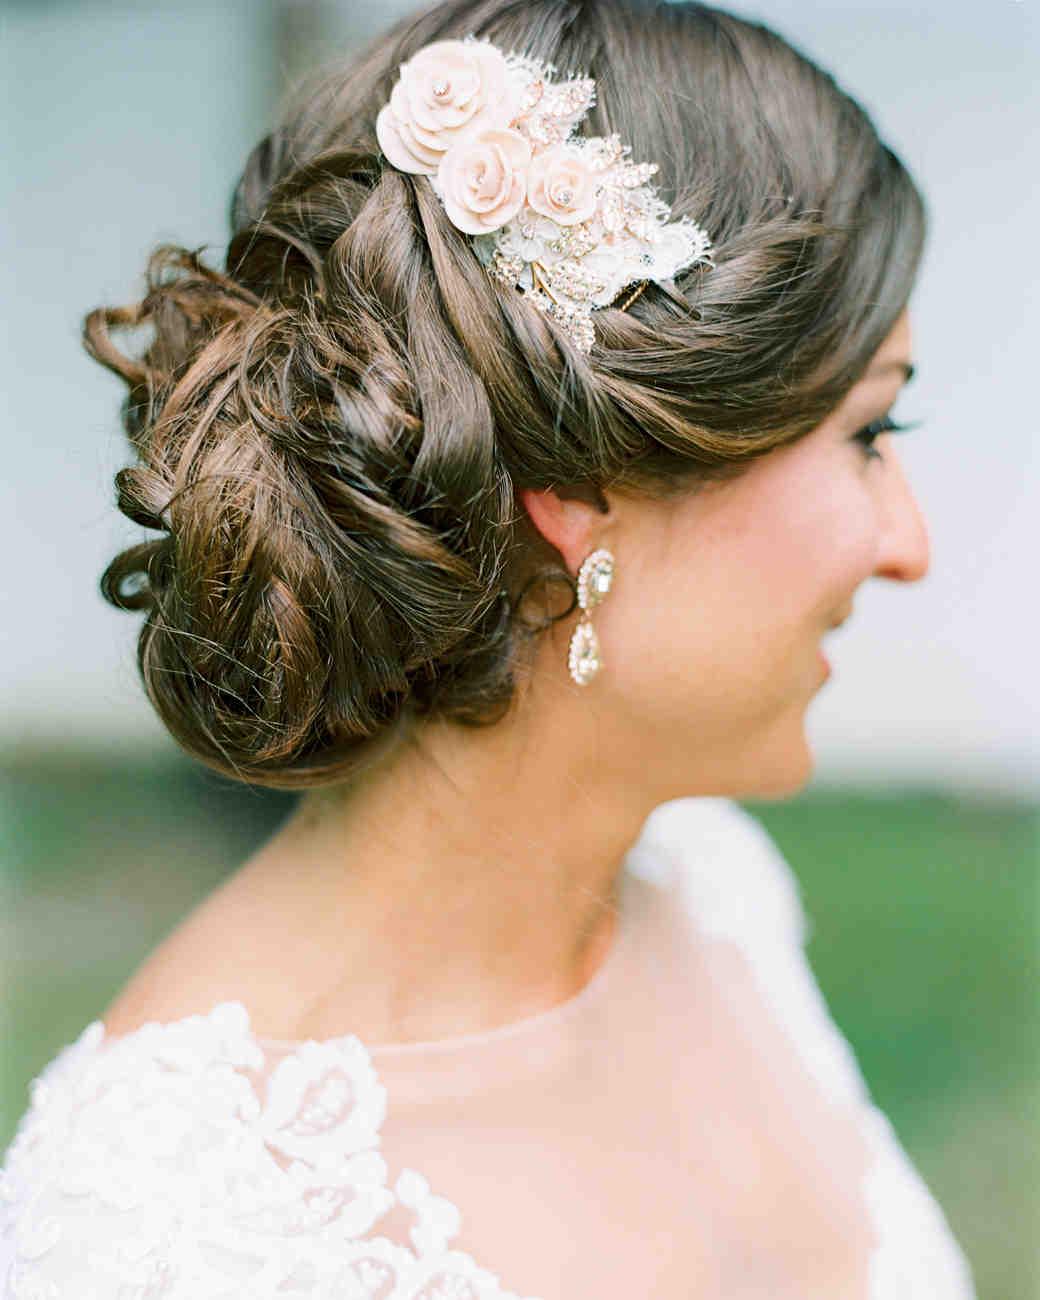 molly-nate-wedding-headshot-098-s111479-0814.jpg